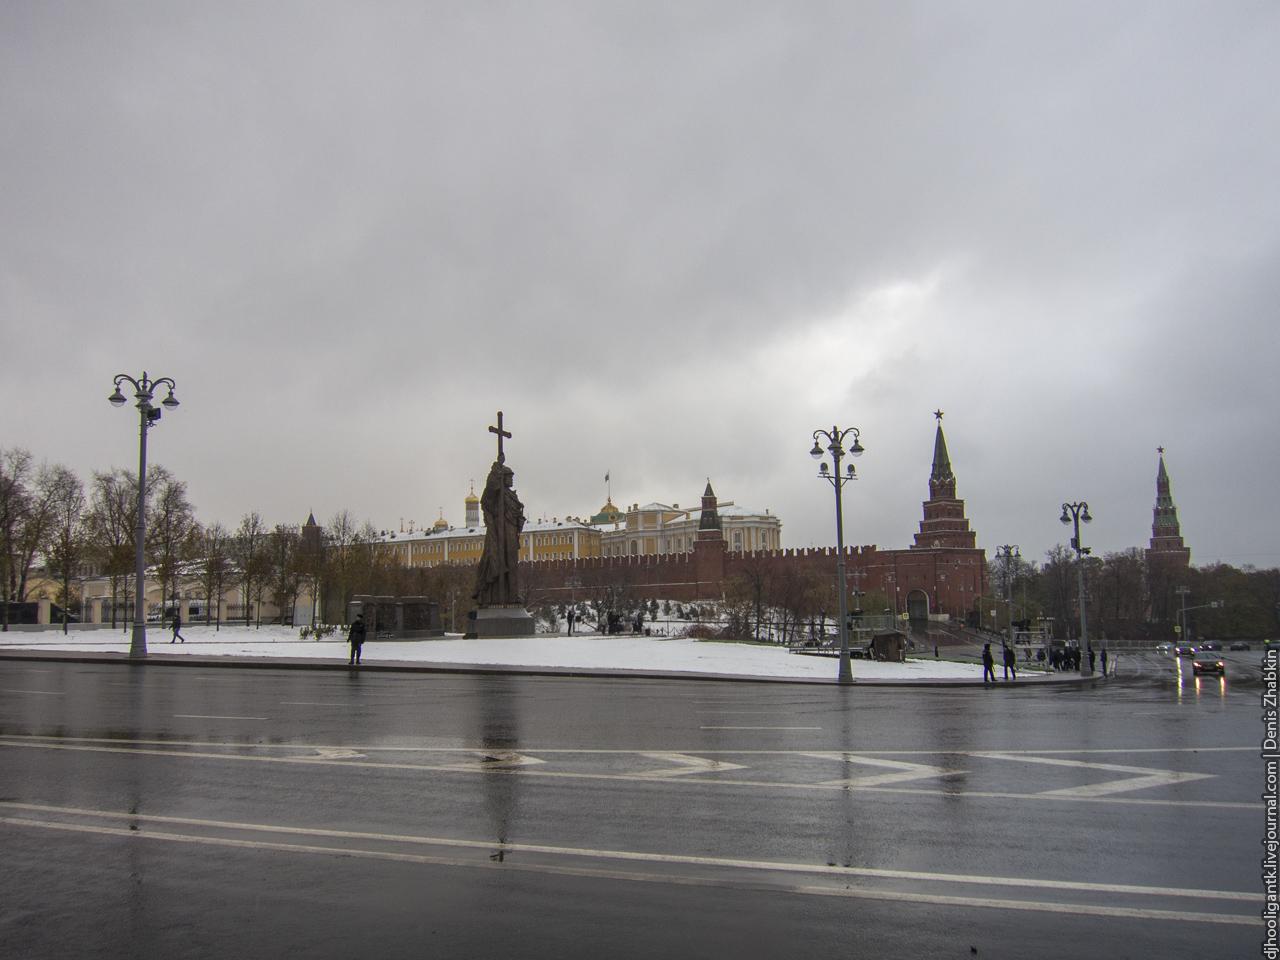 Москва. Памятник князю Владимиру